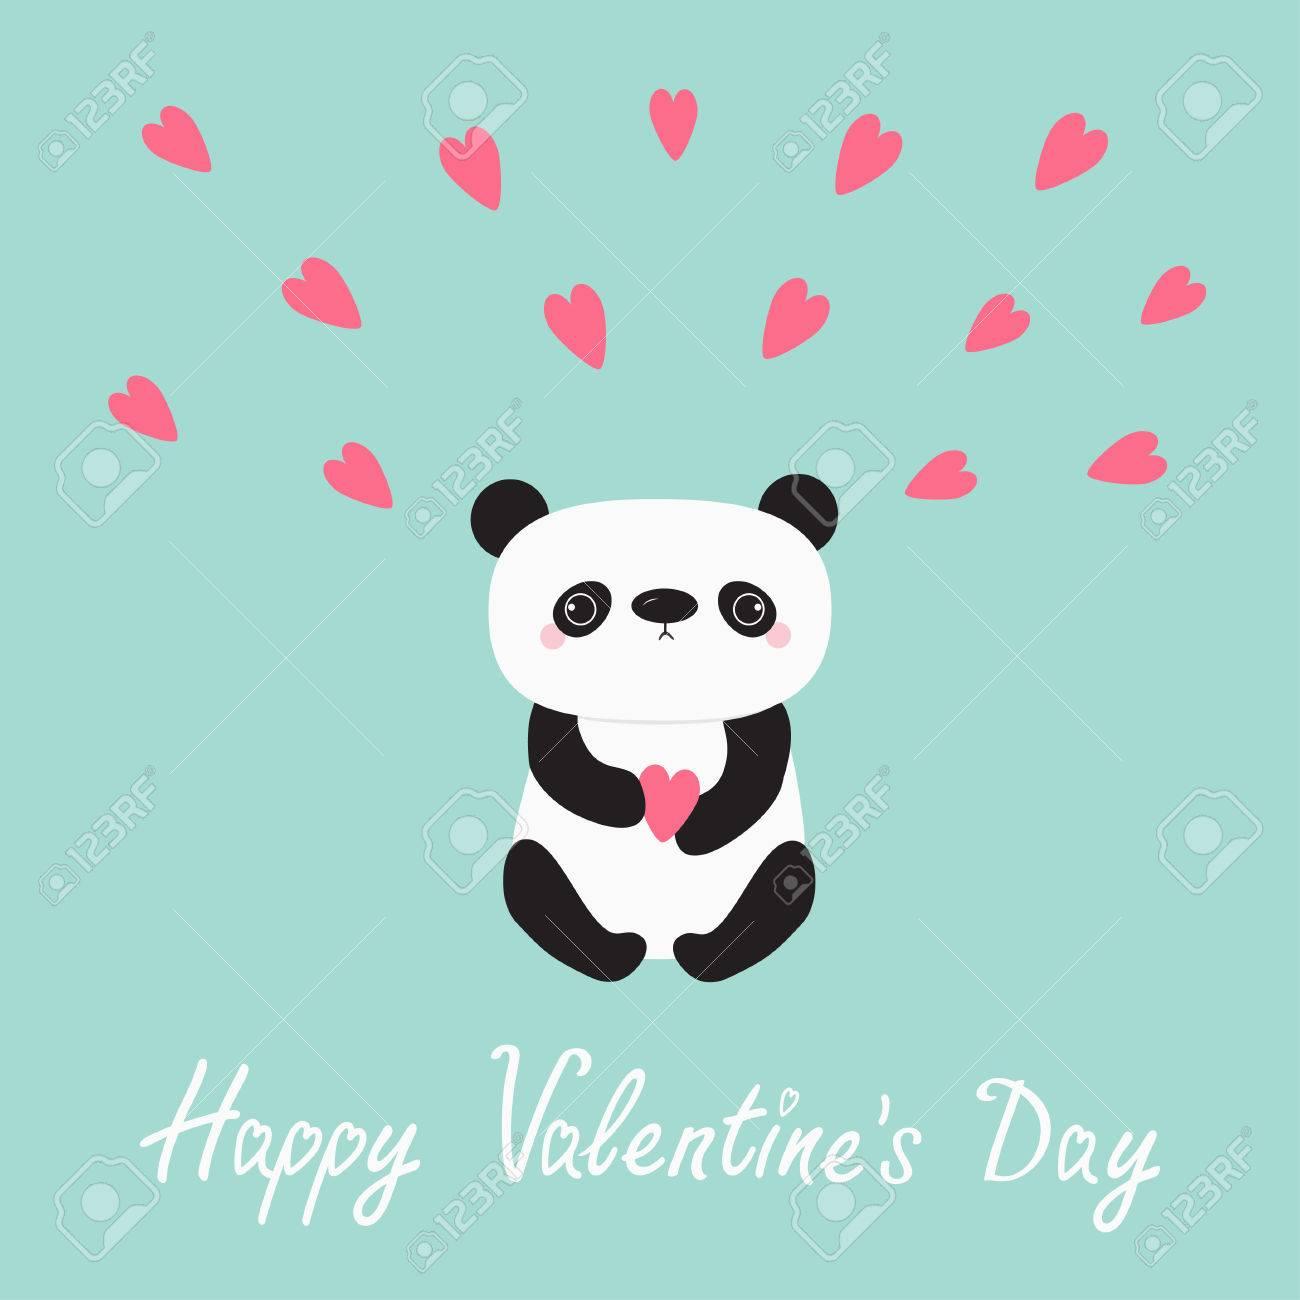 Panda Baby Bear Cute Cartoon Character Holding Pink Heart Happy